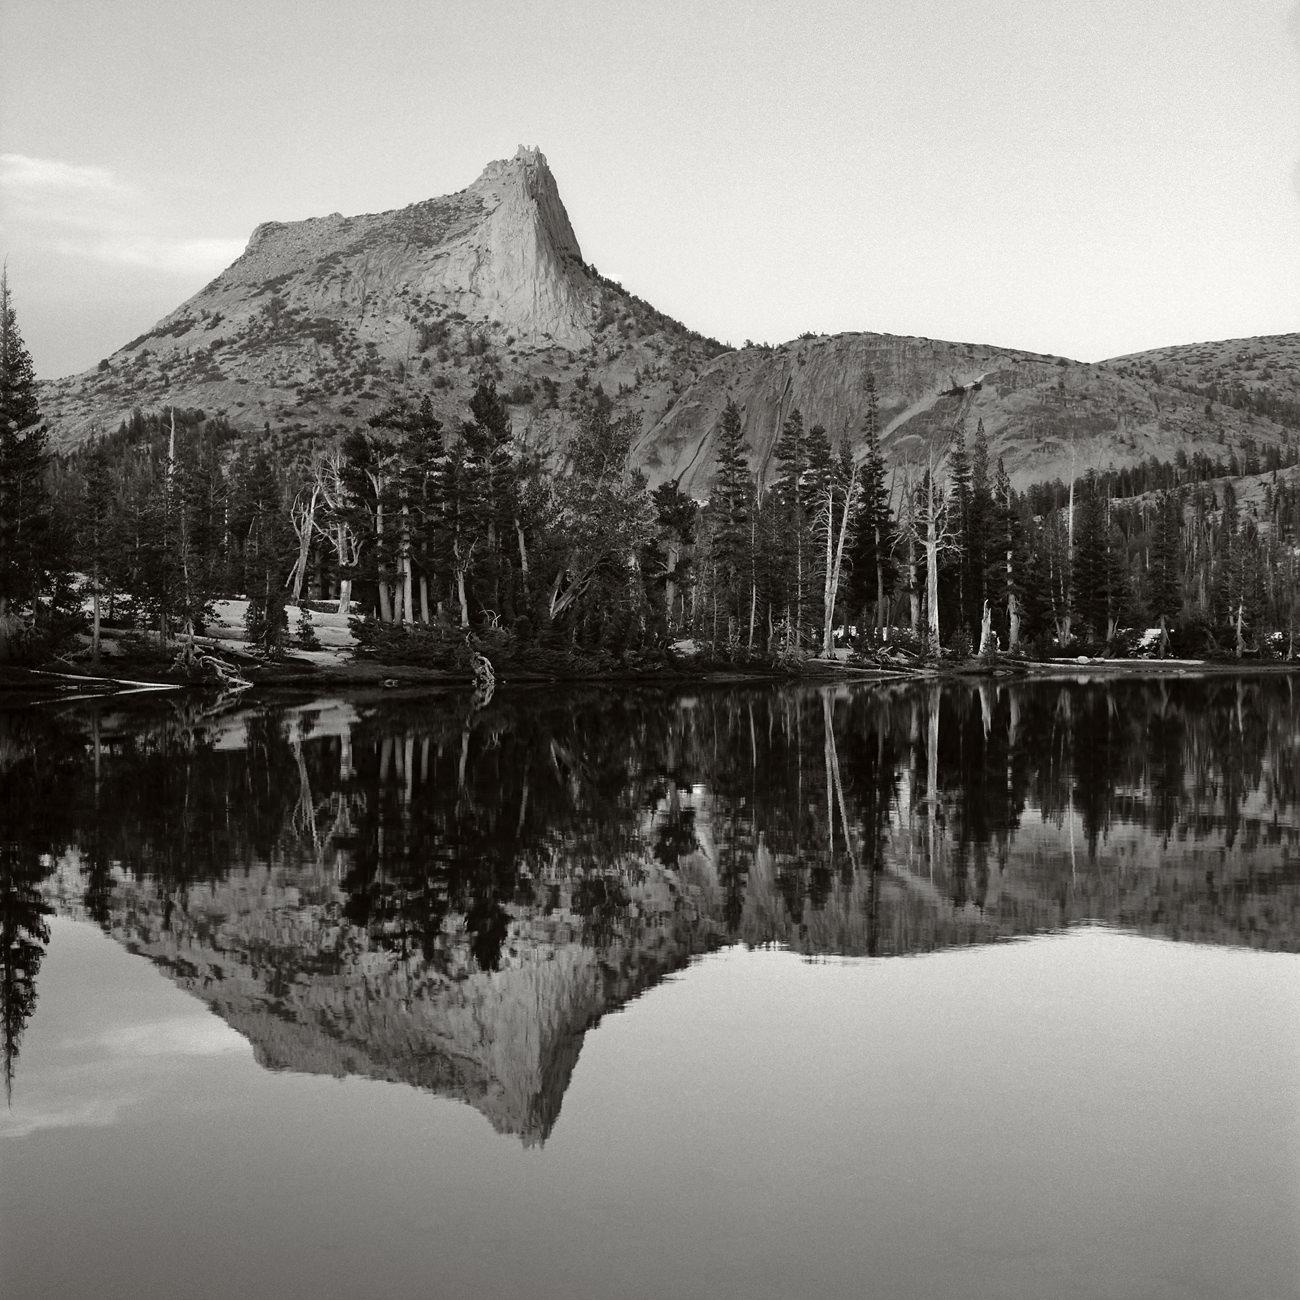 Yosemite_Cathedral_Lakes_7.jpg